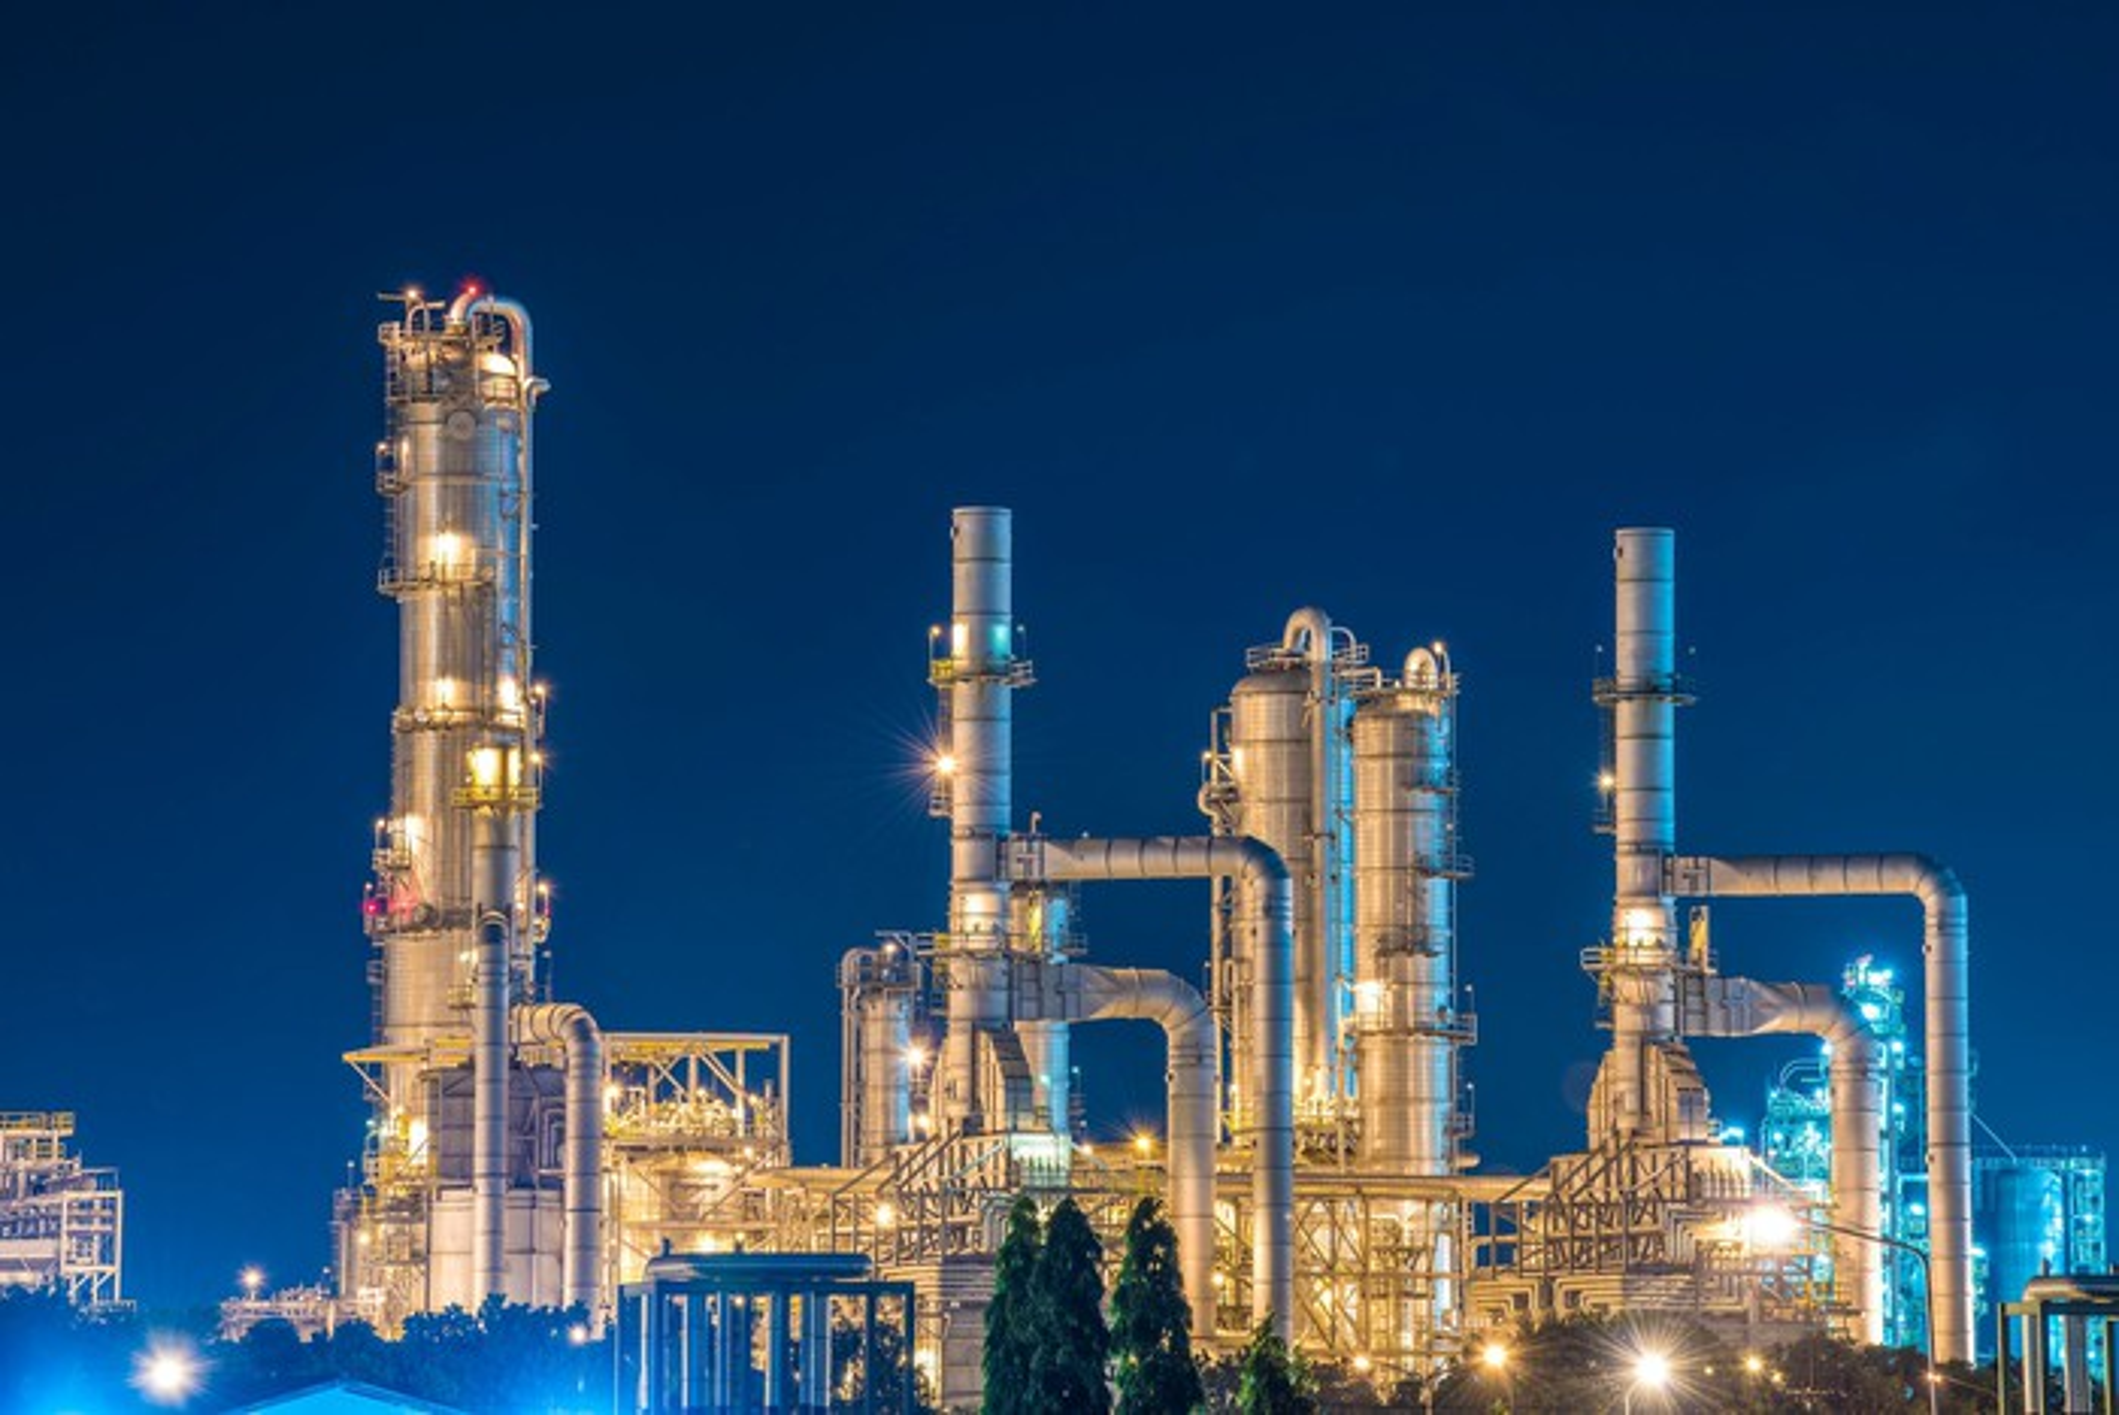 Oil refinery against dark blue sky